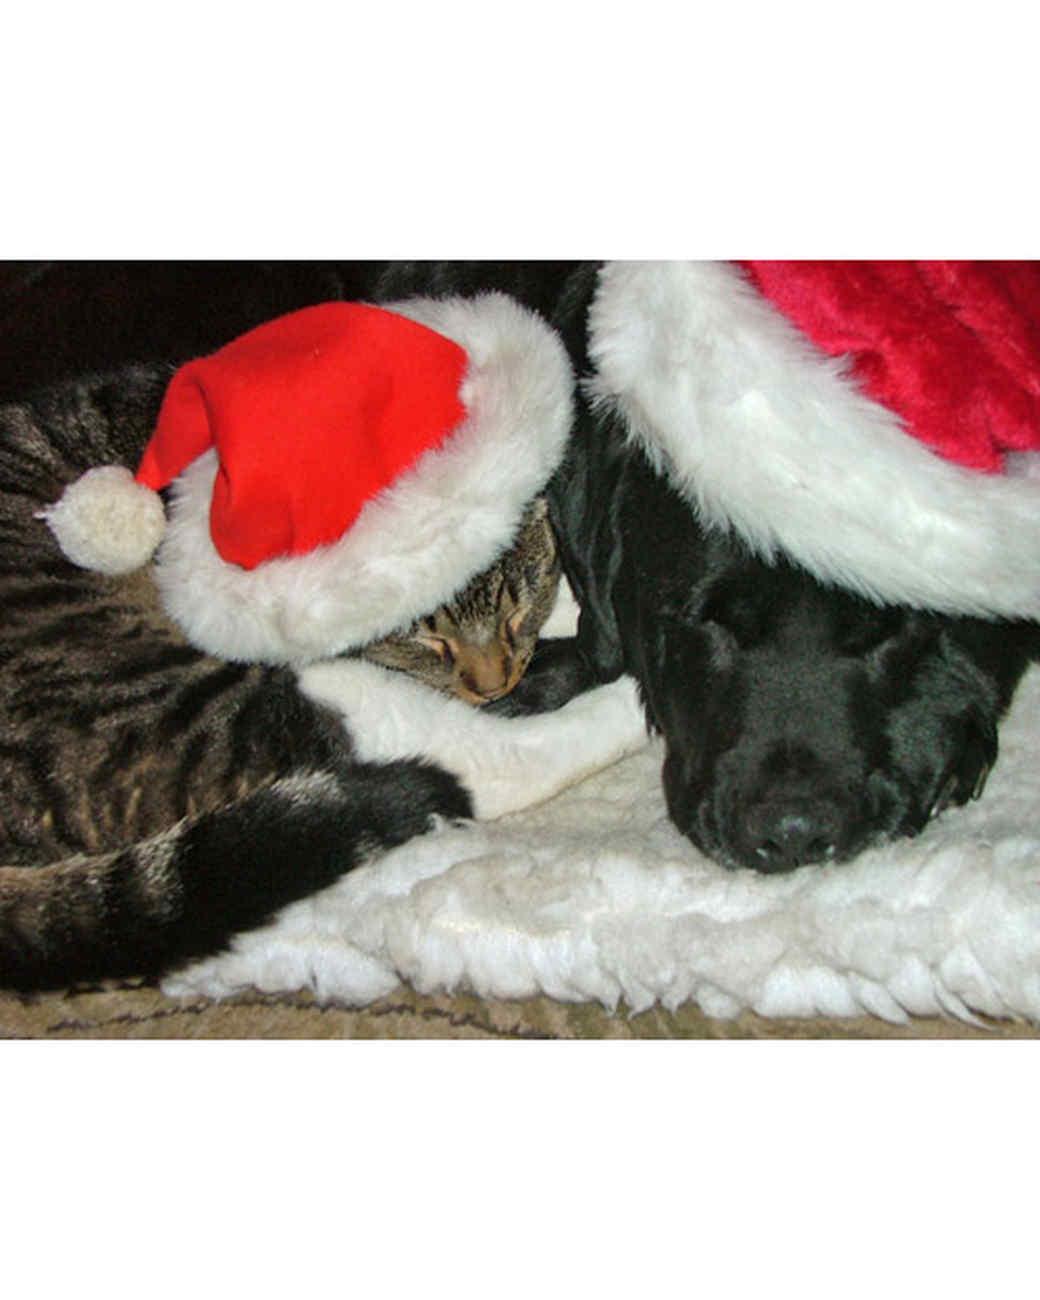 pets_santa09_6718445_11866409_main.jpg